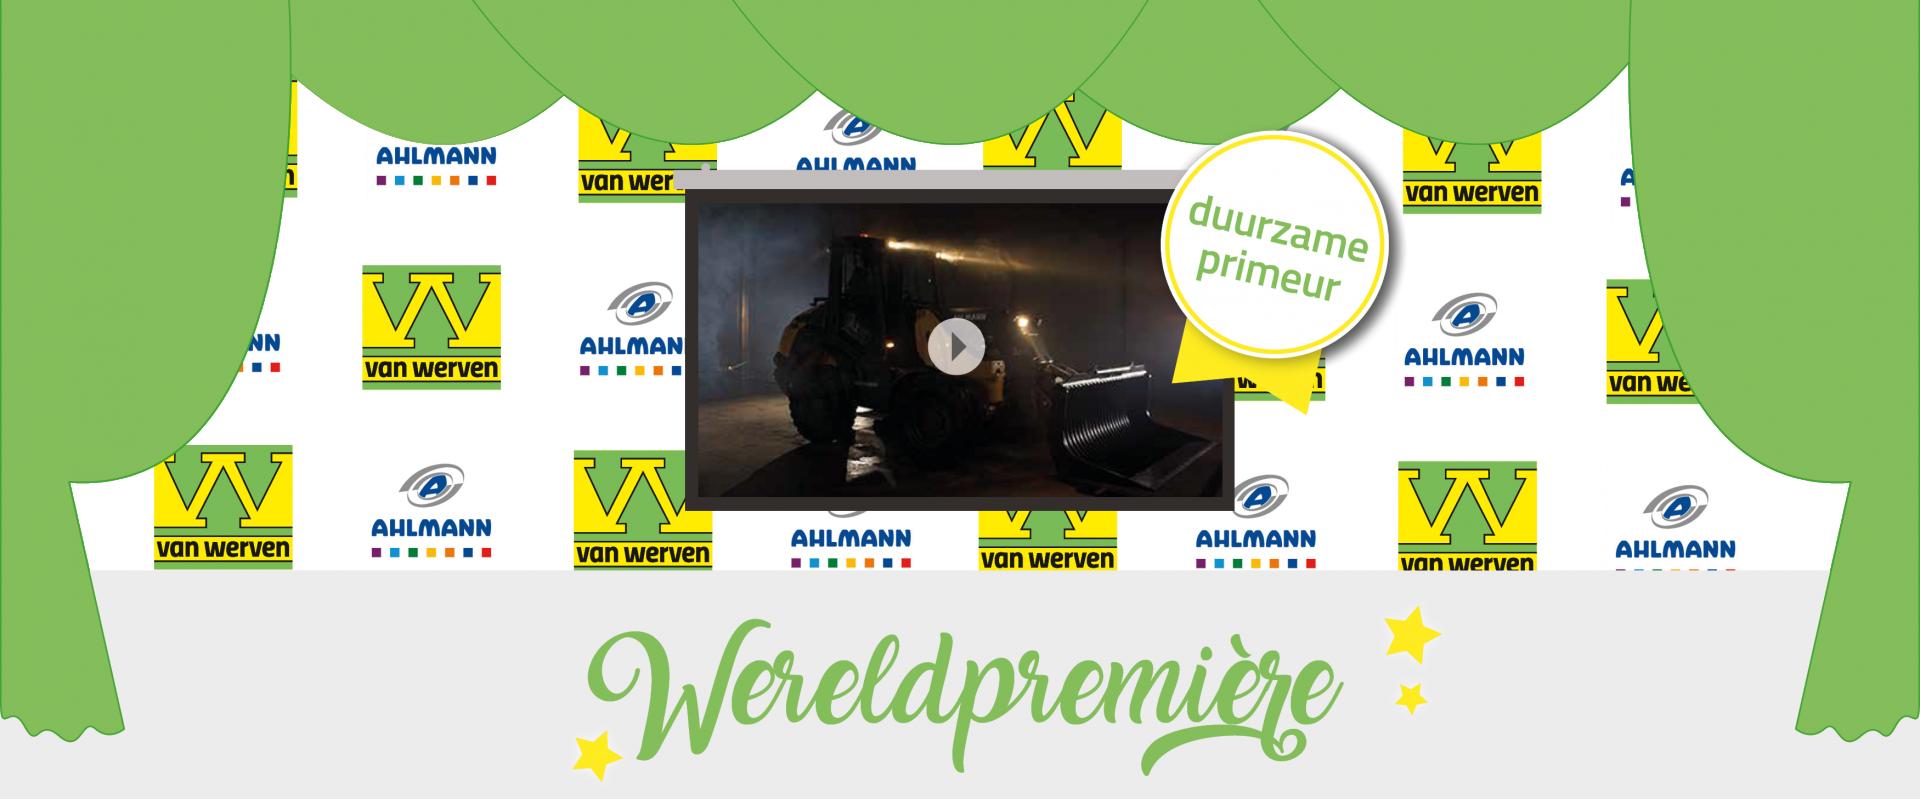 Duurzame primeur Ahlmann & Van Werven